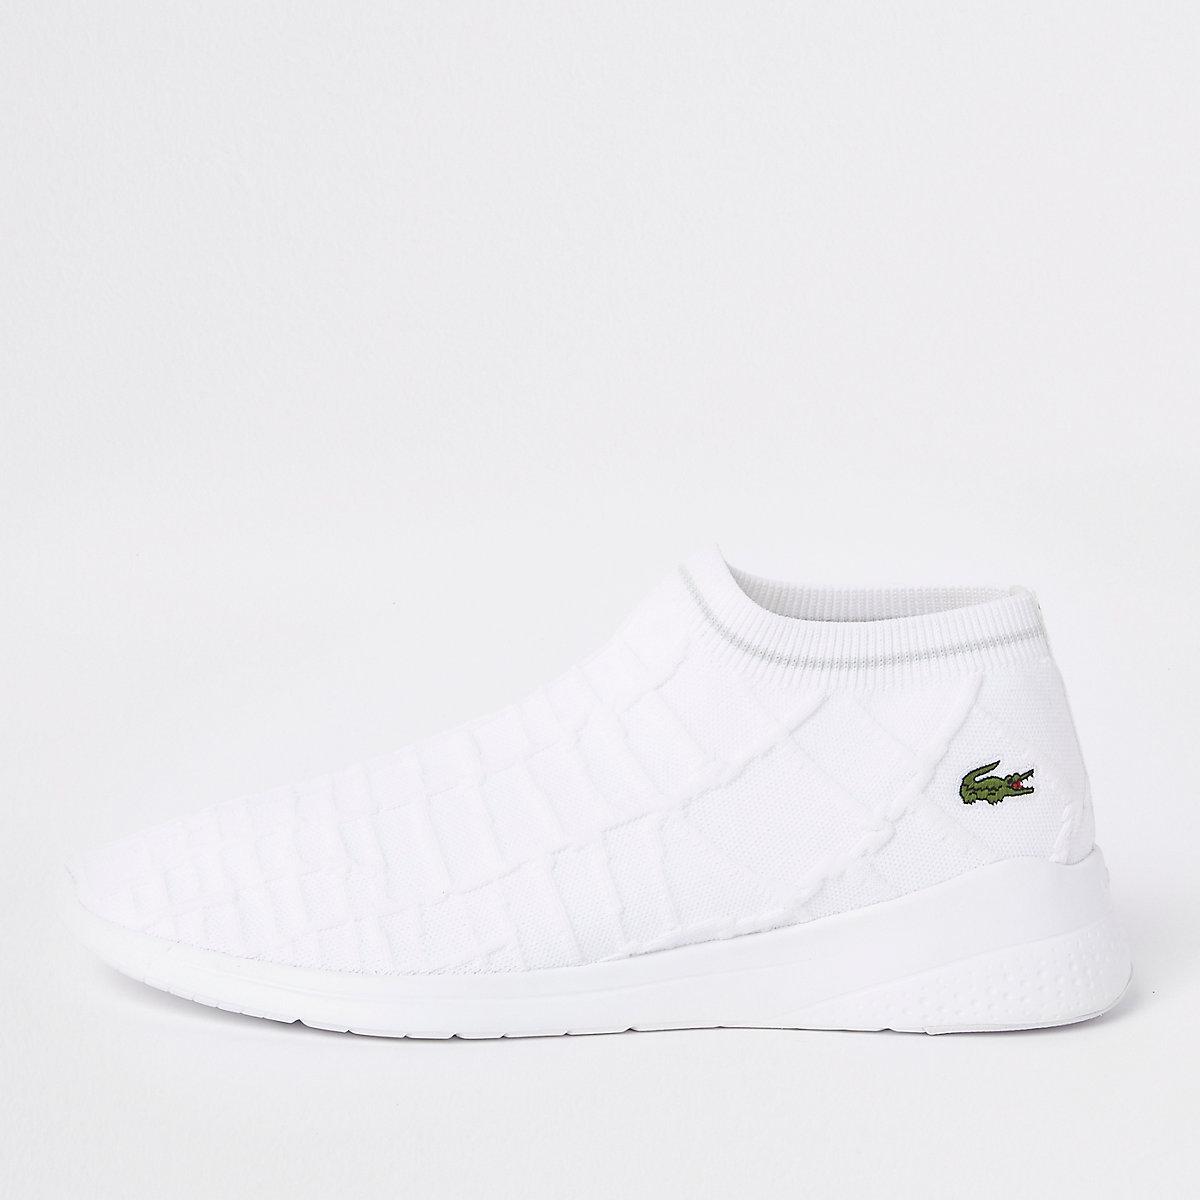 Lacoste white sock sneakers